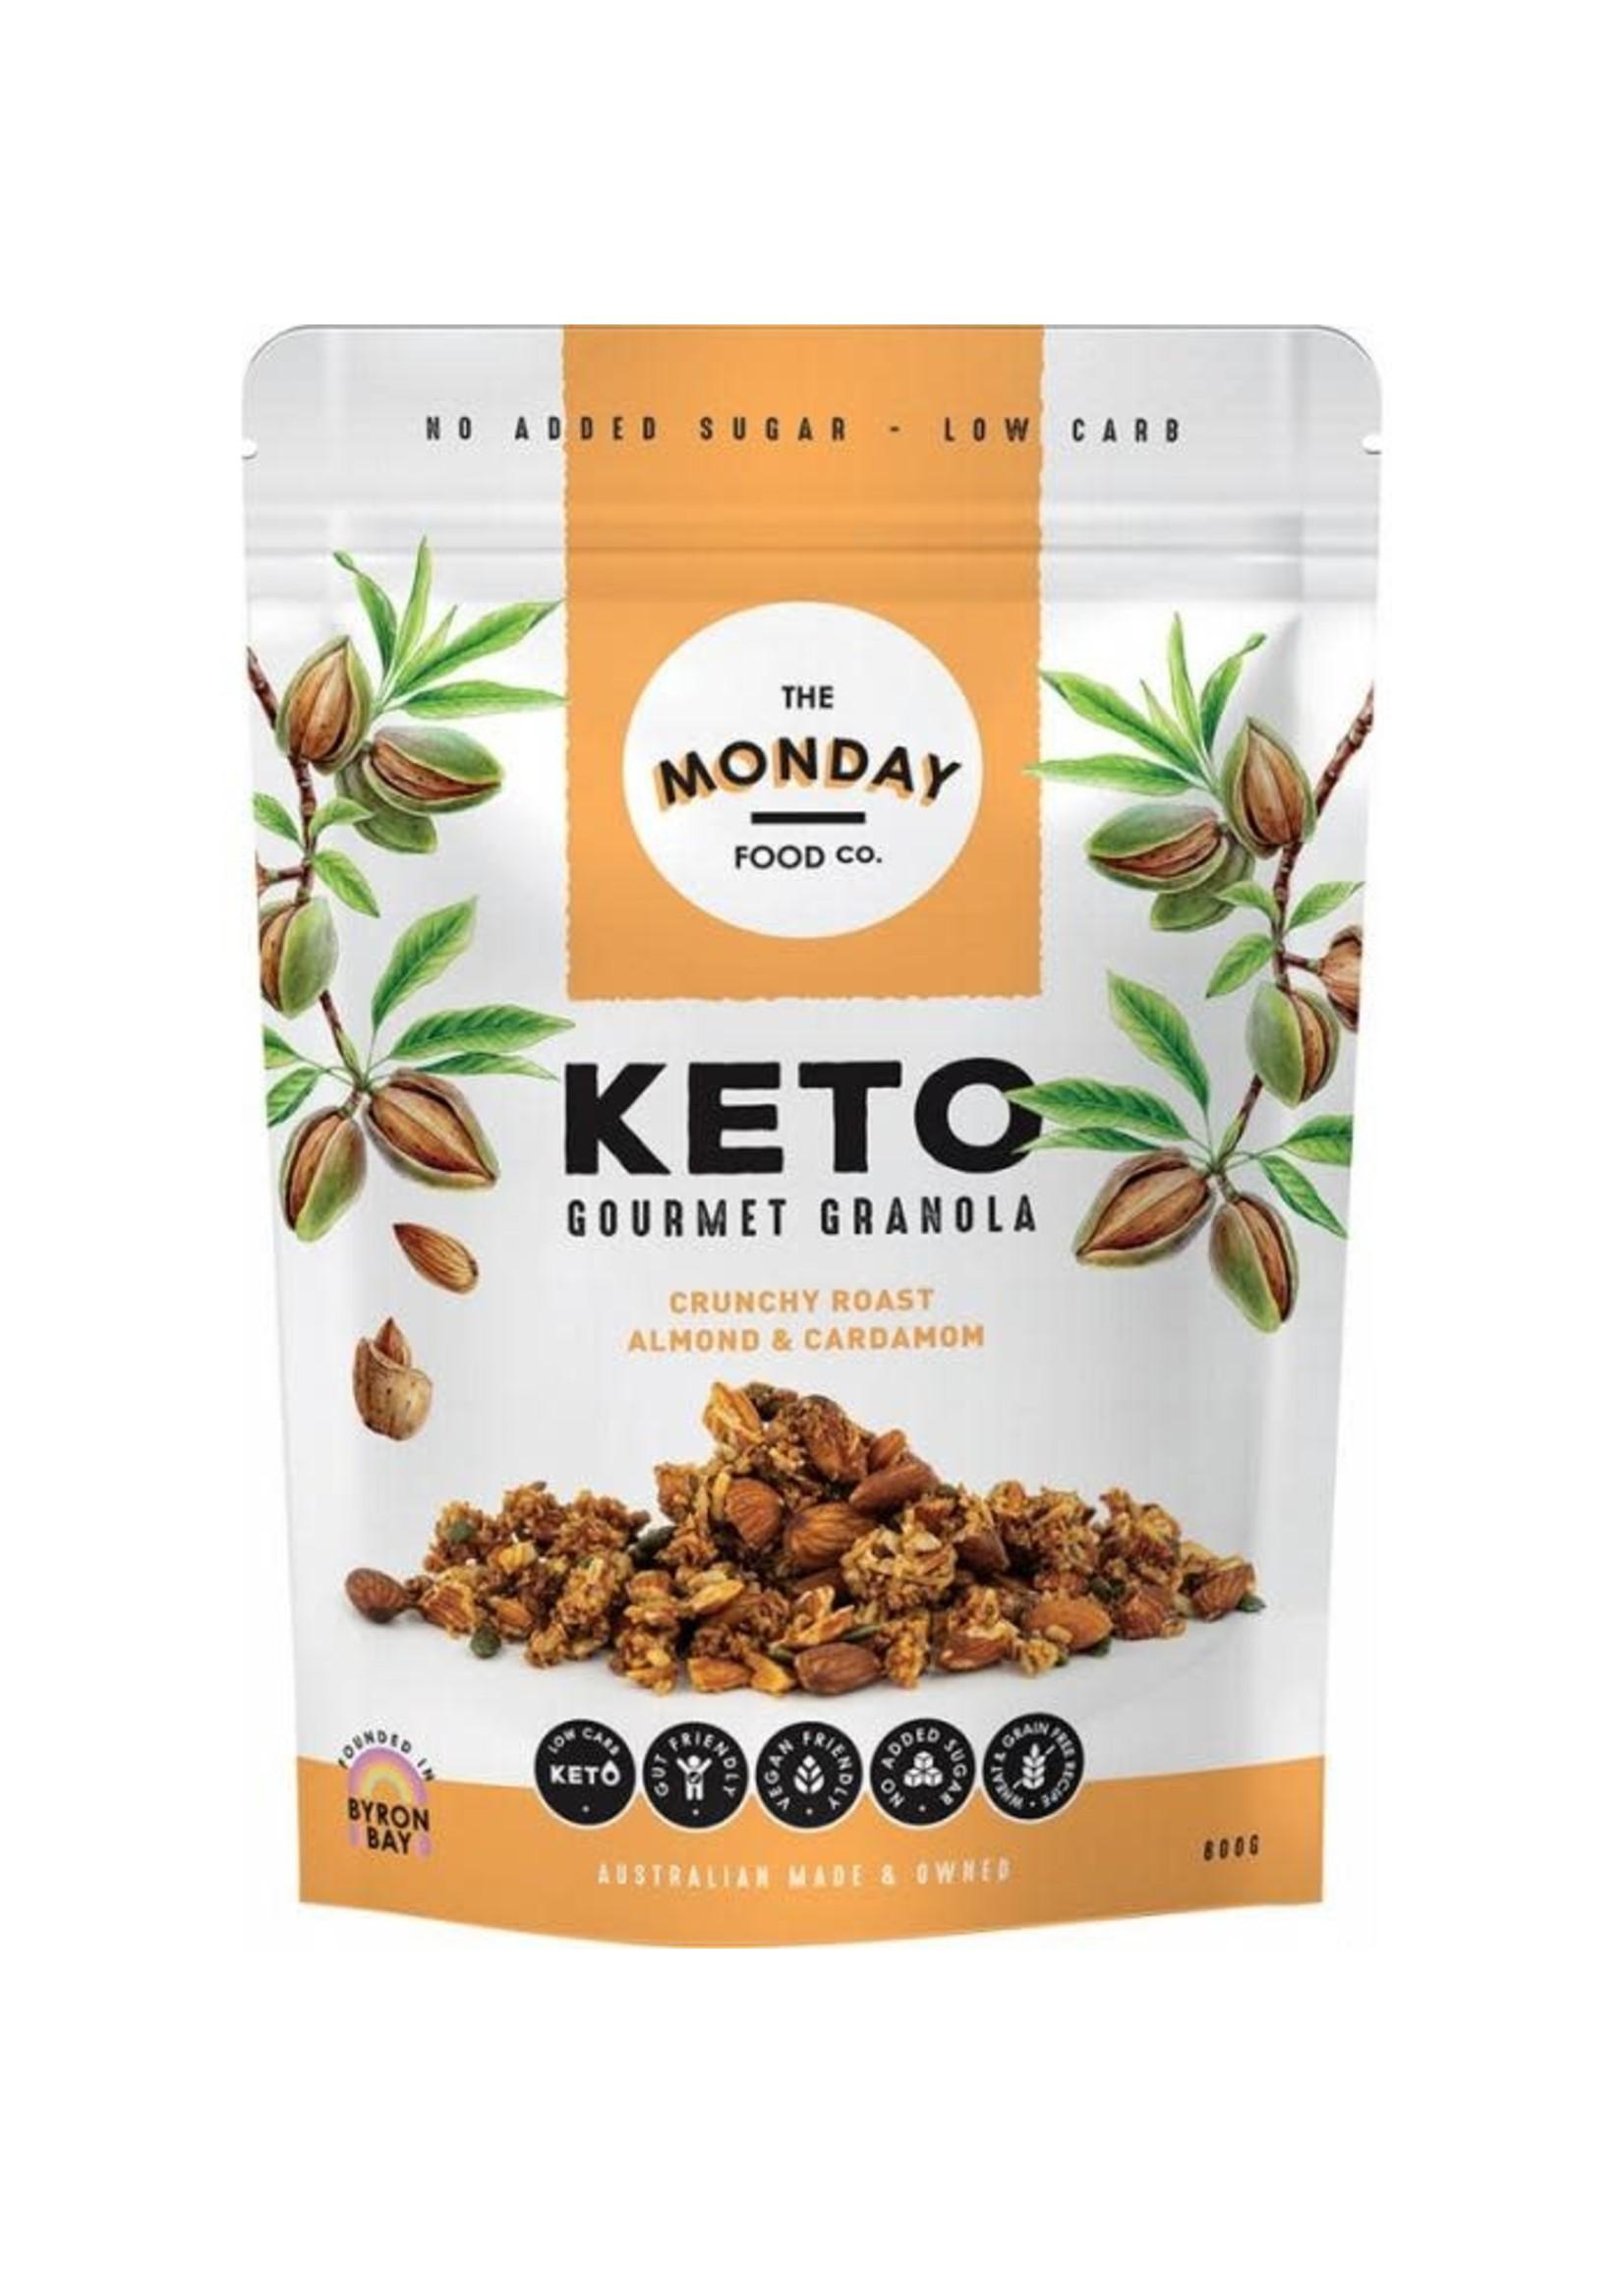 The Monday Food Co. The Monday Food Co. Keto Gourmet Granola Crunchy Roast Almond & Cardamom 300g